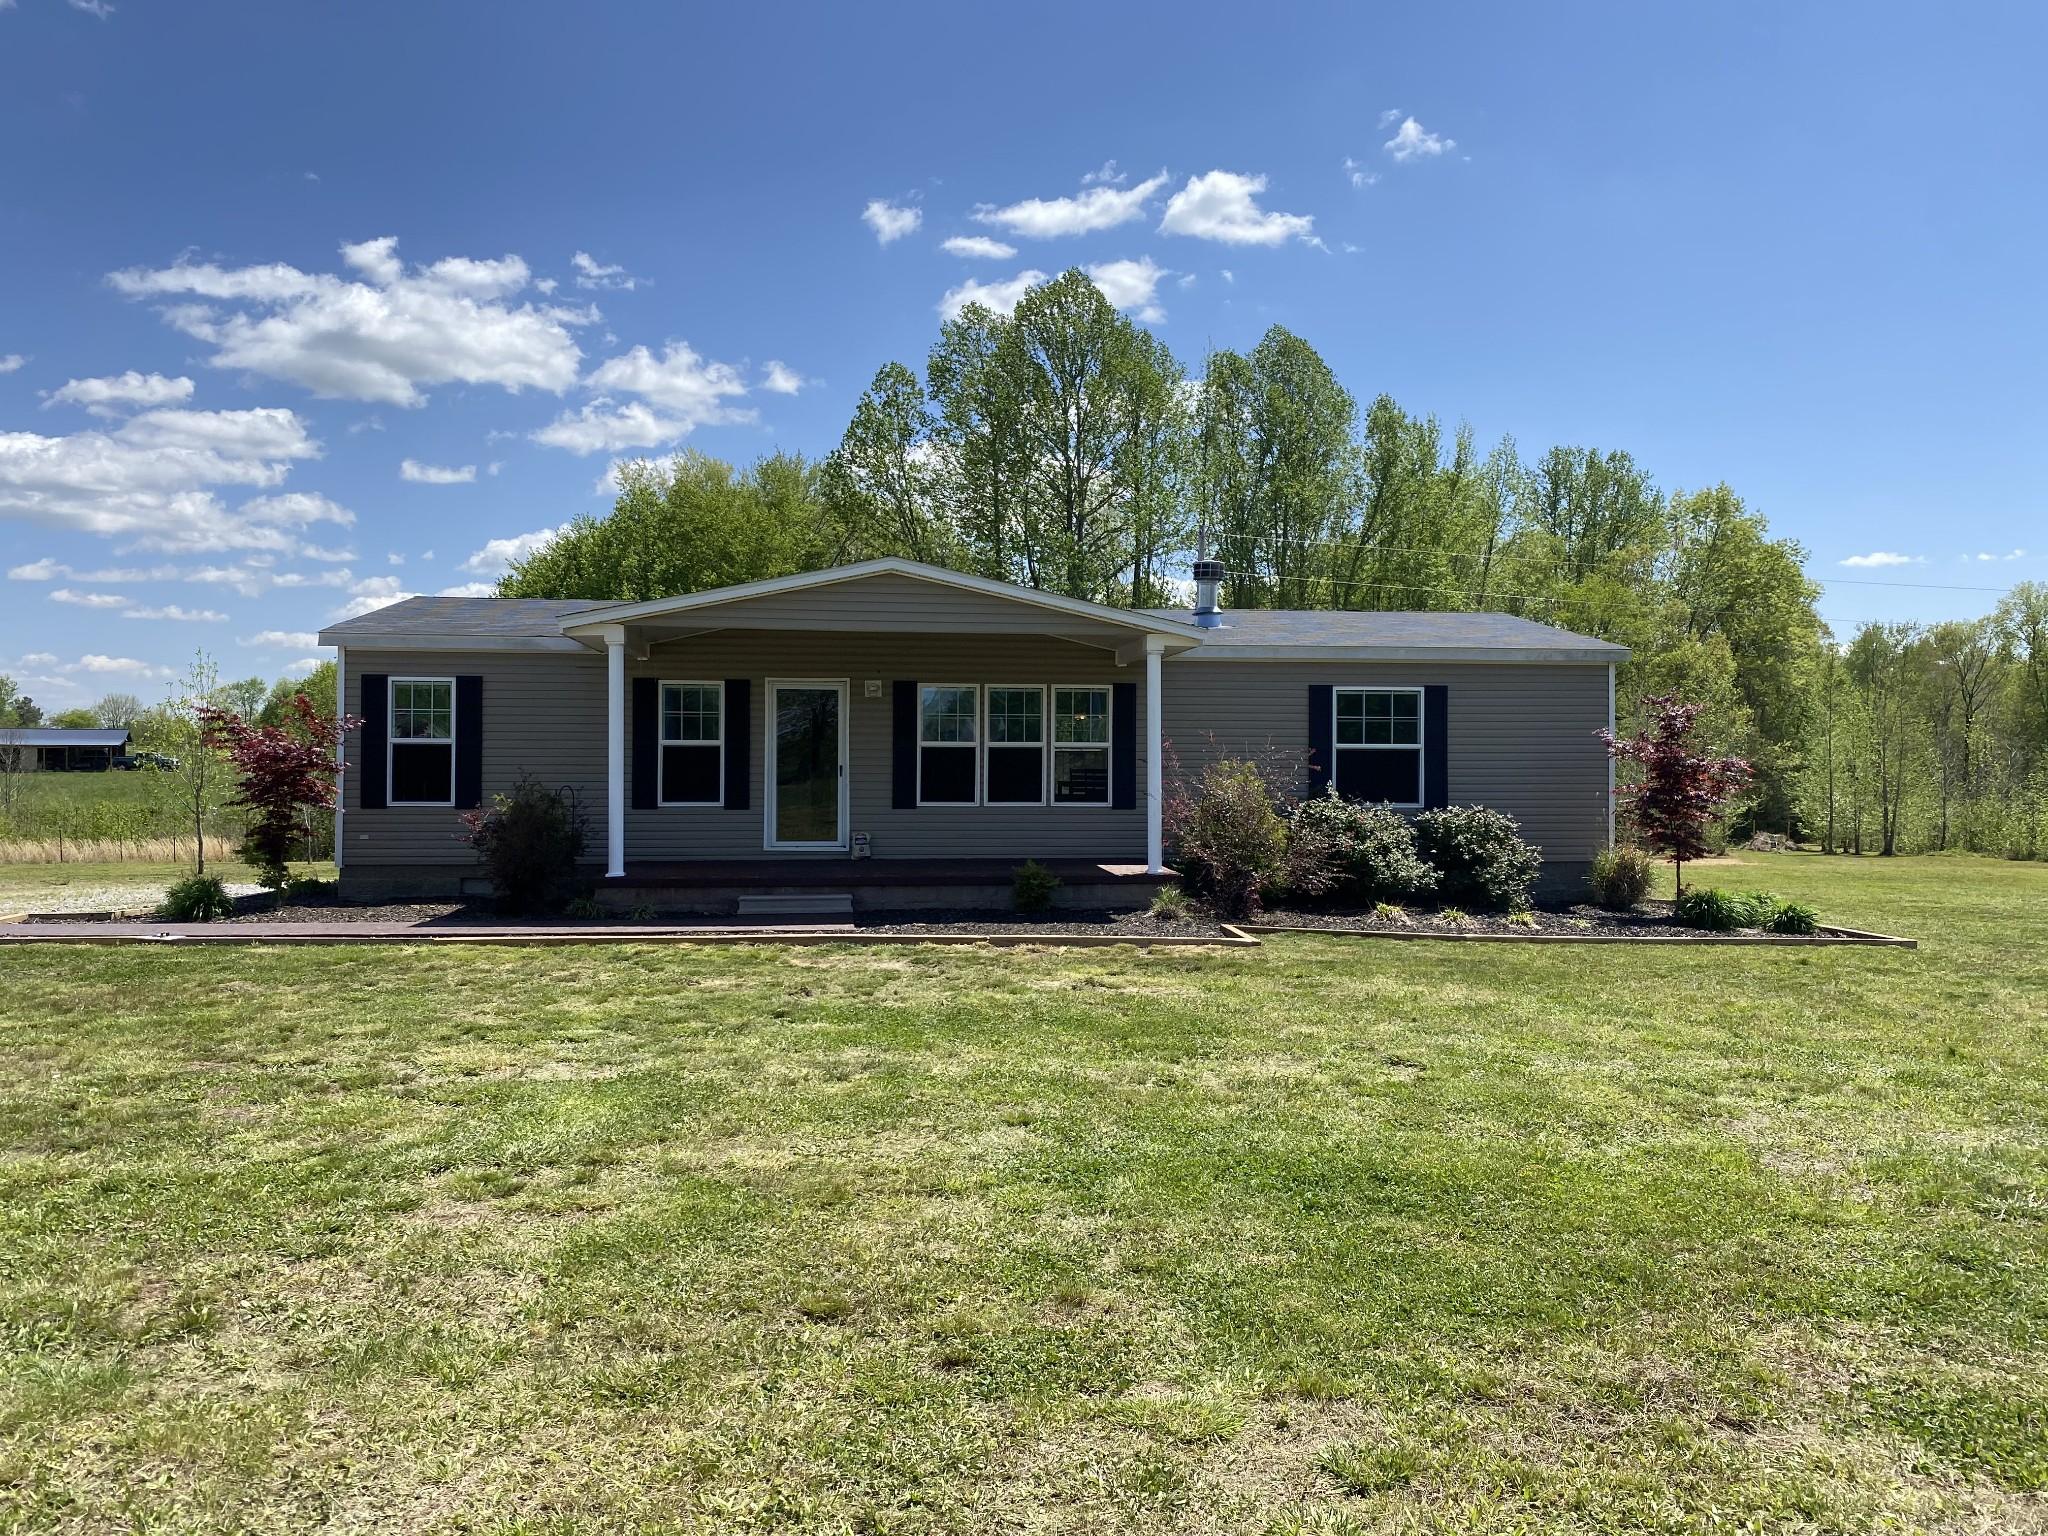 145 Abernathy Rd Property Photo - Pulaski, TN real estate listing